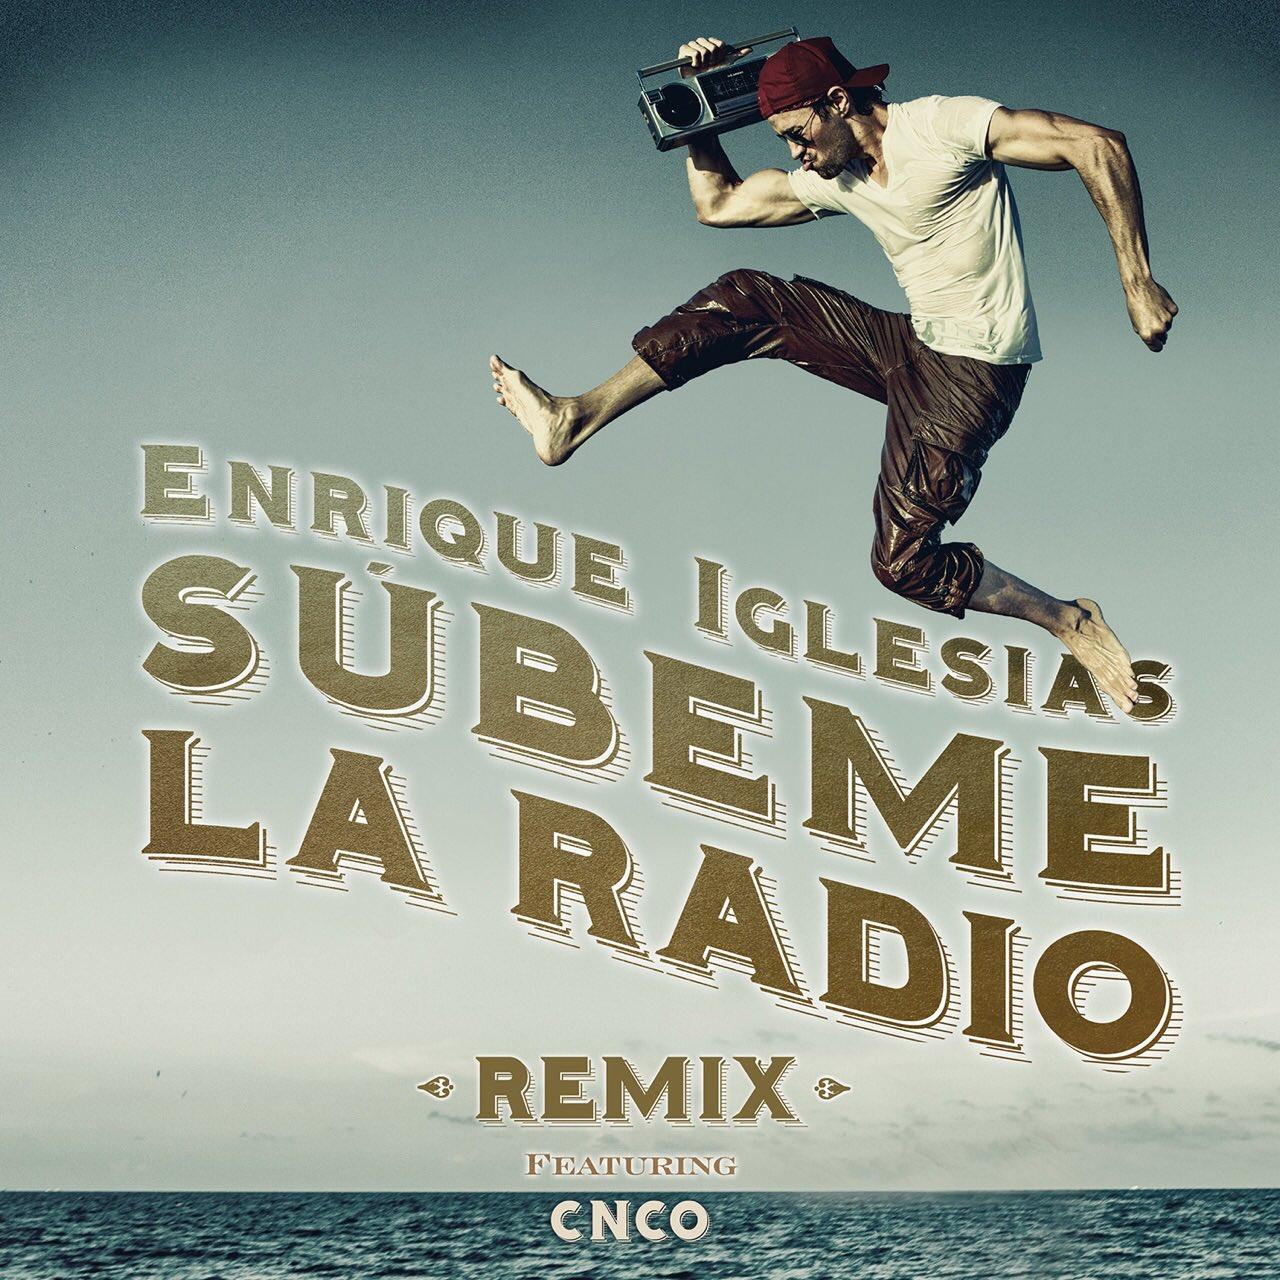 #SUBEMELARADIO remix @CNCOMusic mañana!!!! https://t.co/wEWKdwIFSN